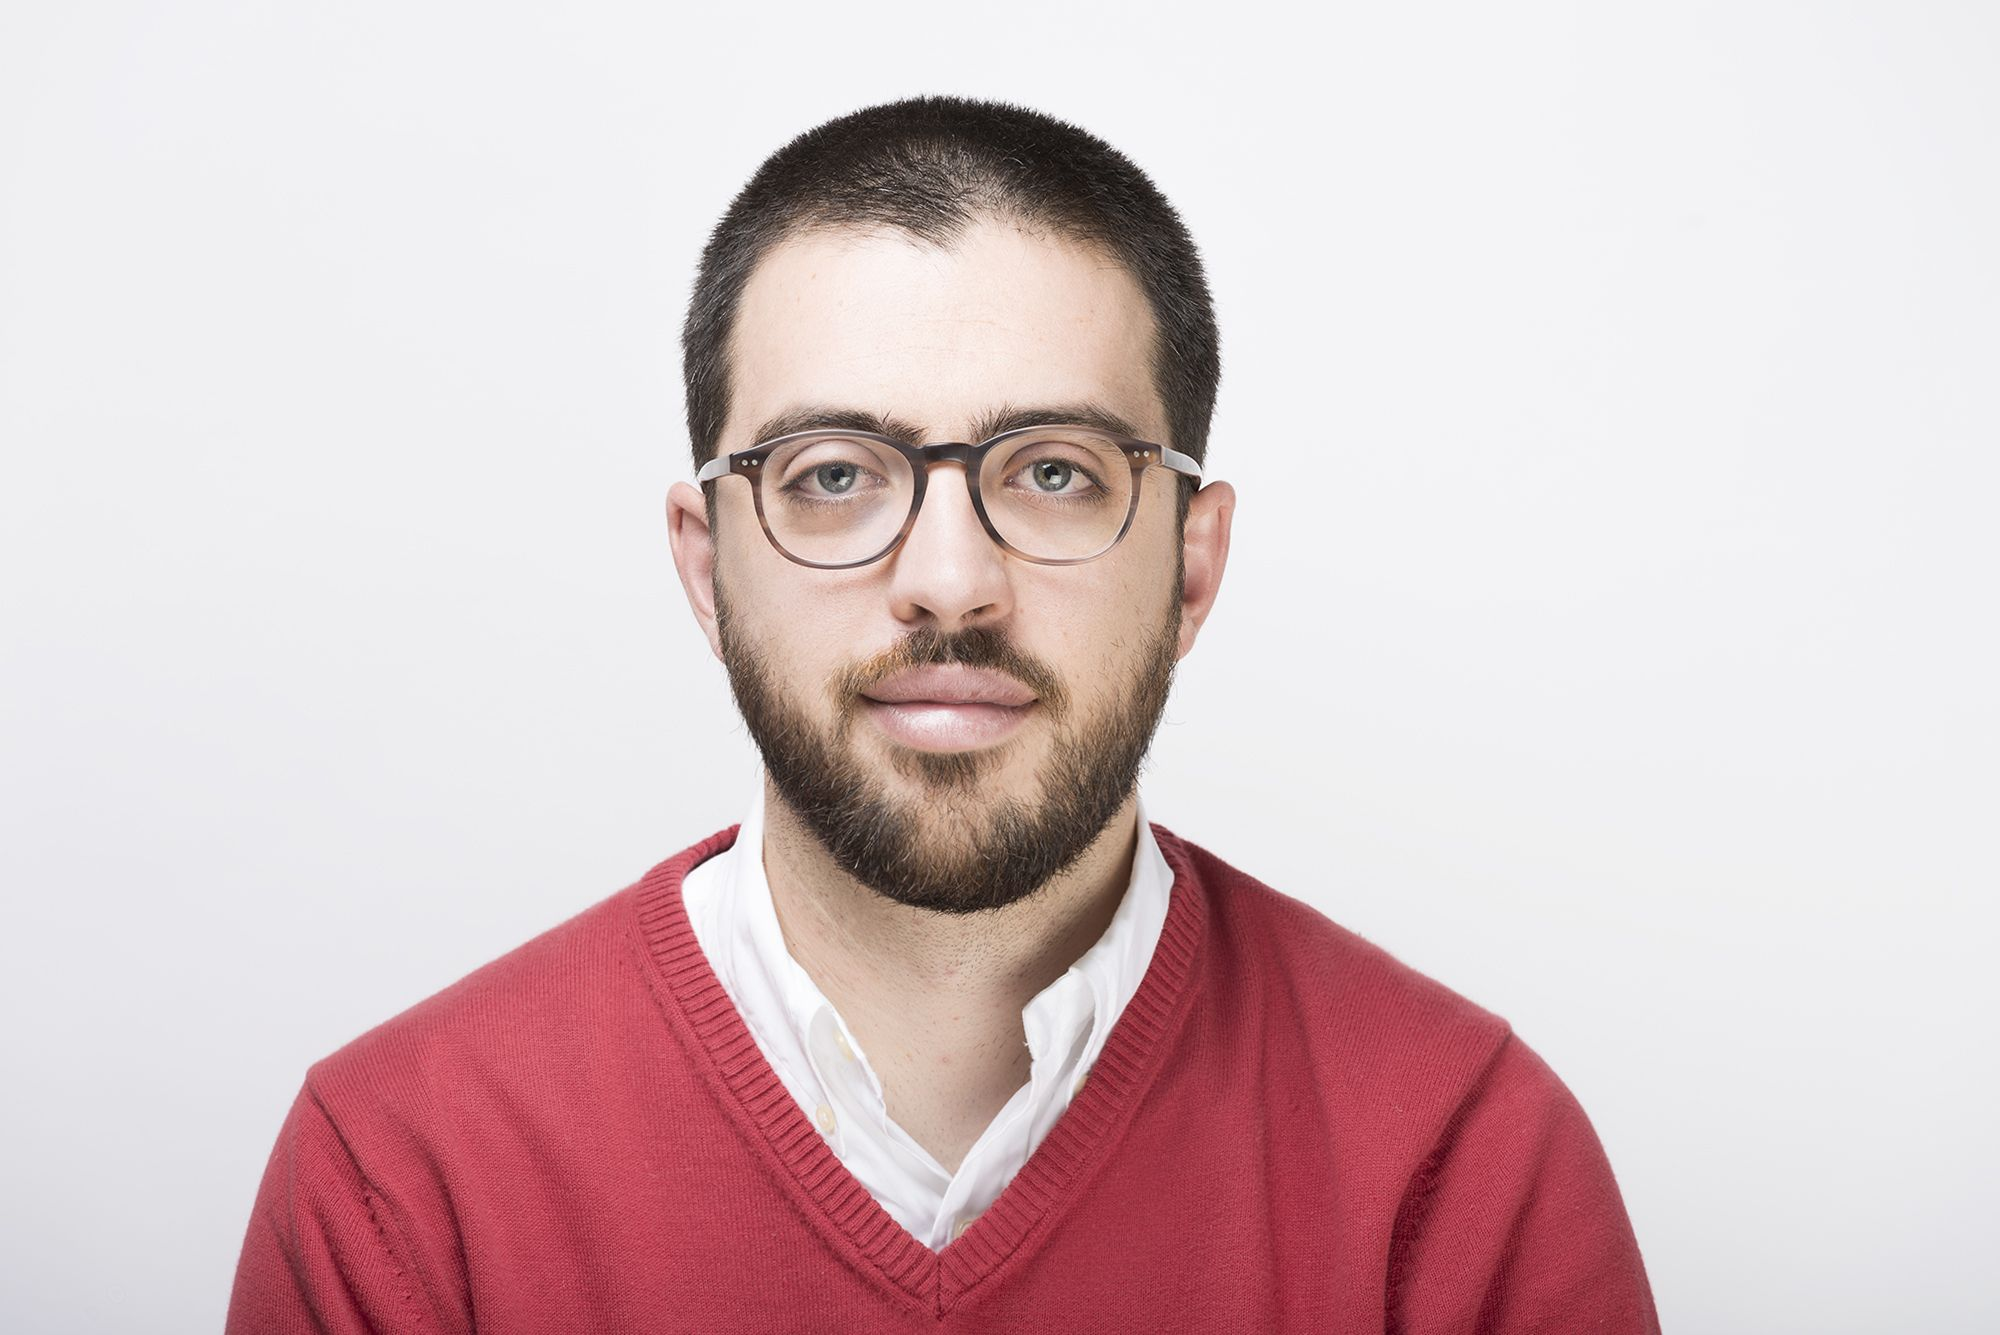 Andreu Pujol Mas (Perfil)